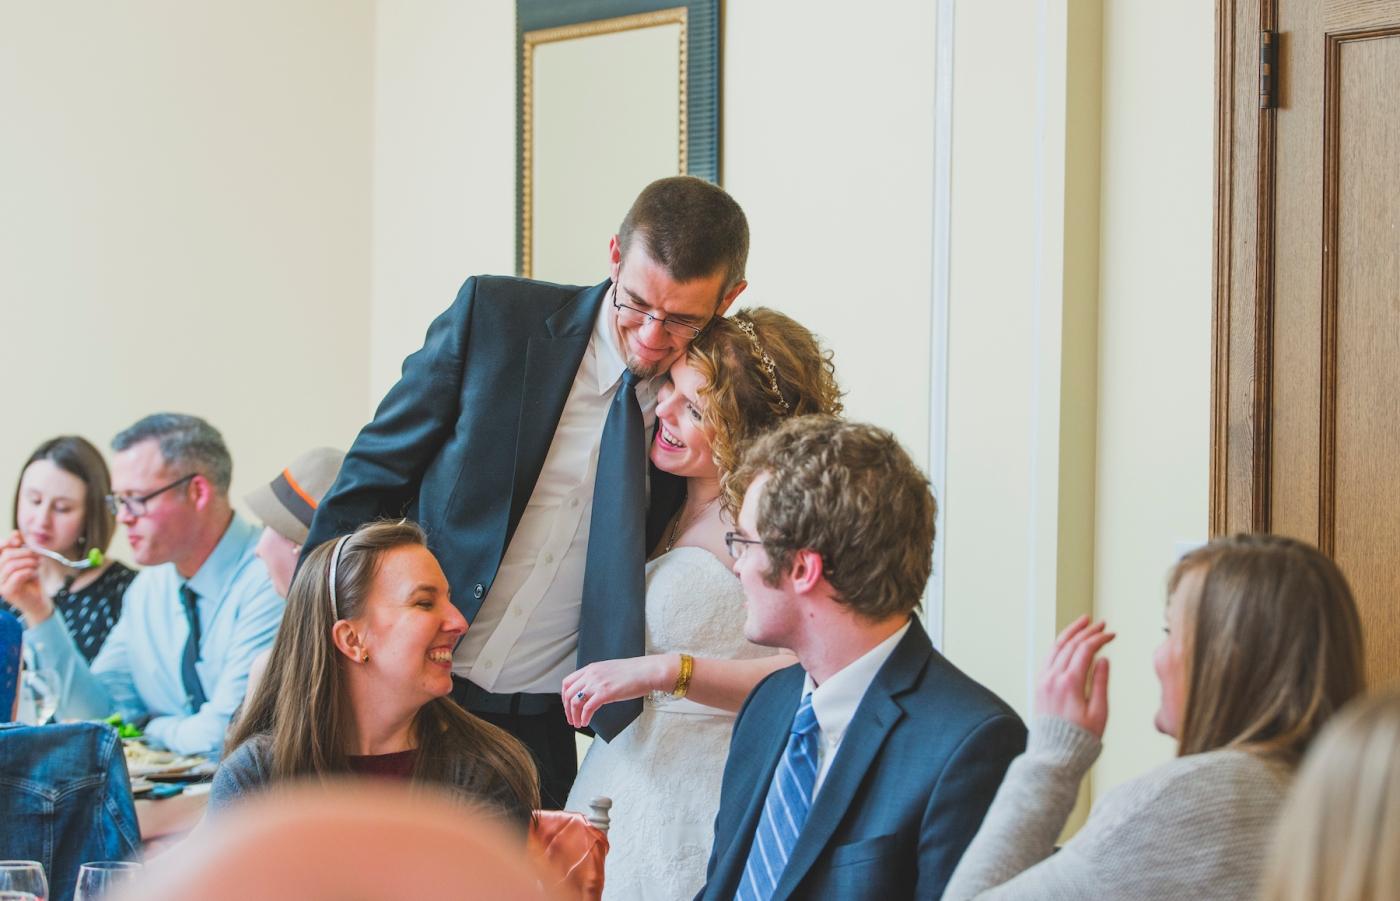 DSC_3200Everett_Wedding_Ballroom_Jane_Speleers_photography_Rachel_and_Edmund_reception_2017